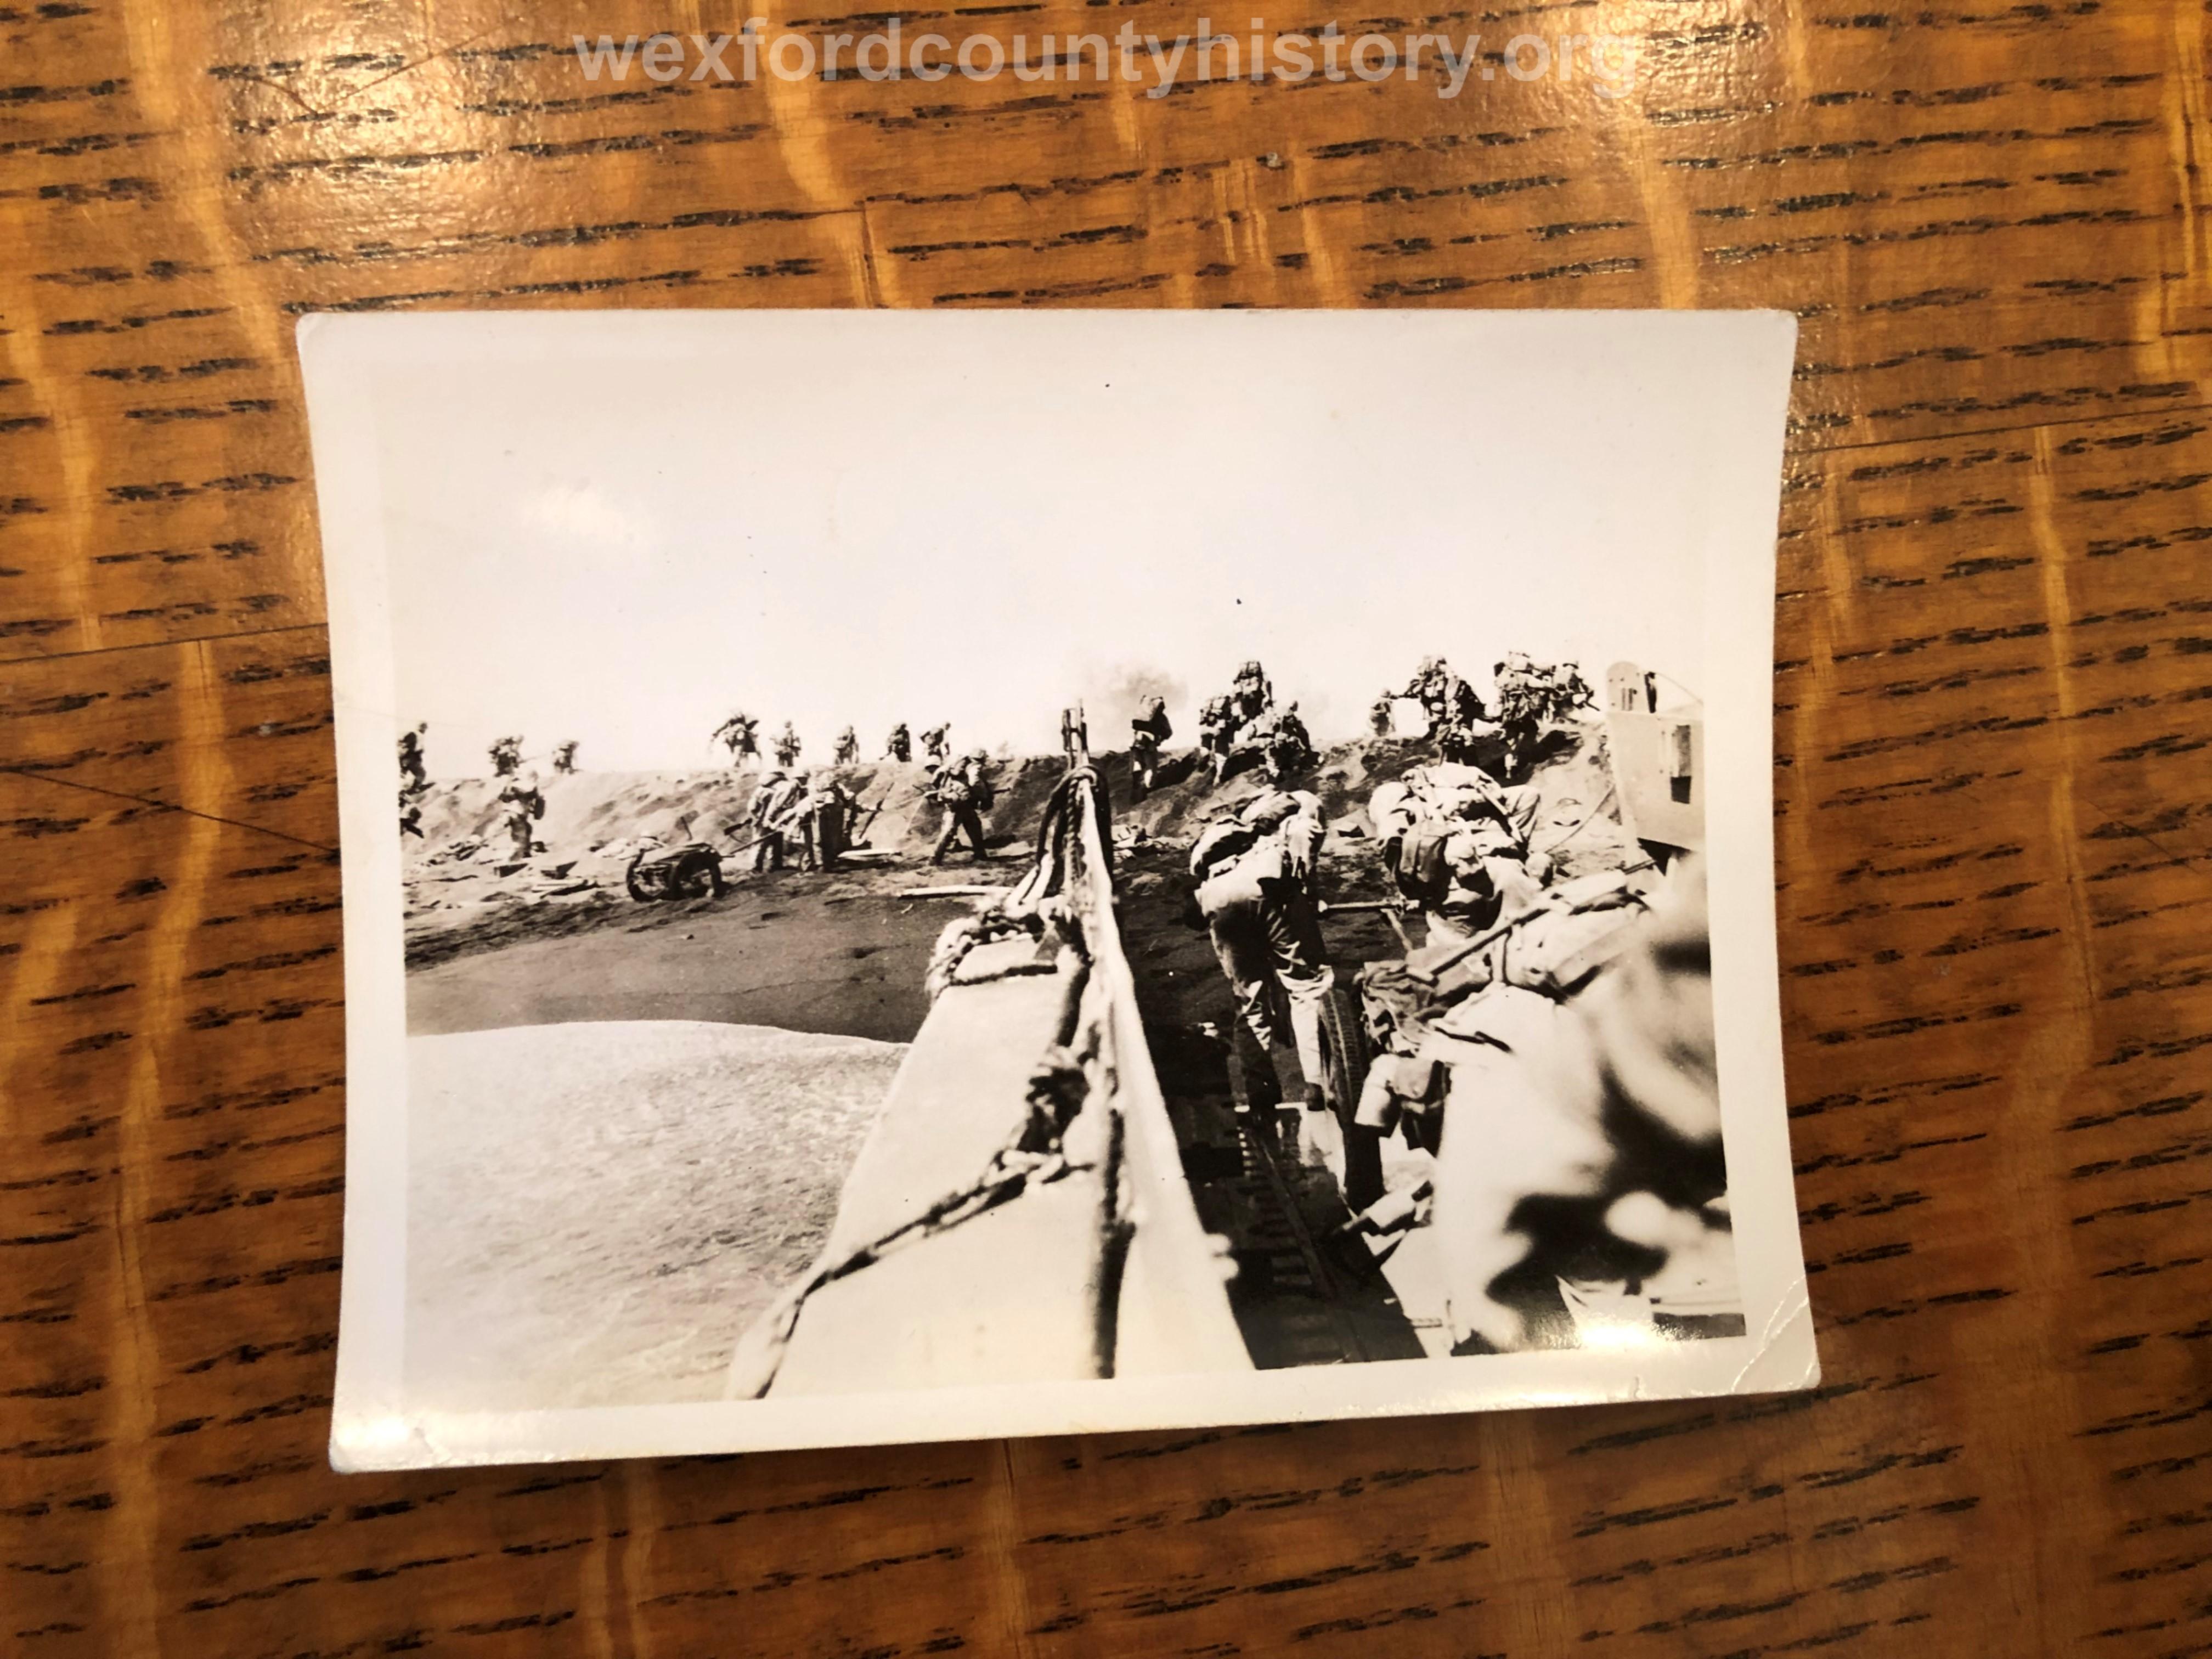 Cadillac-Veterans-Paul-Johnson-World-War-2-Photographs-35